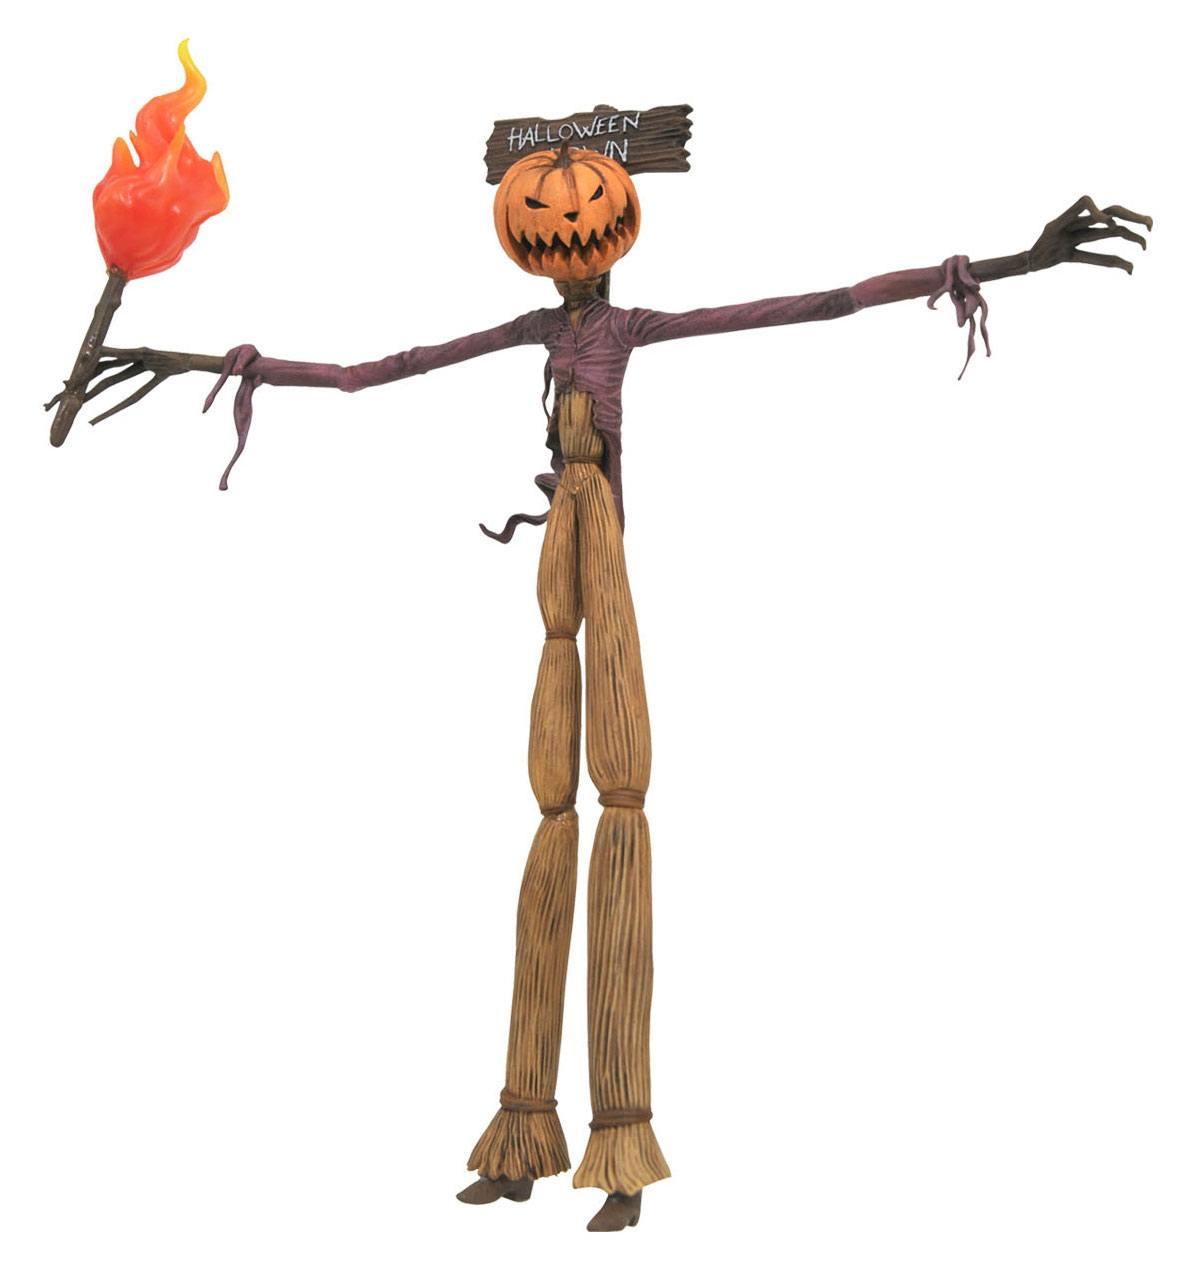 Nightmare before Christmas Select Best Of Action Figure Series 2 Pumpkin King Jack 23 cm